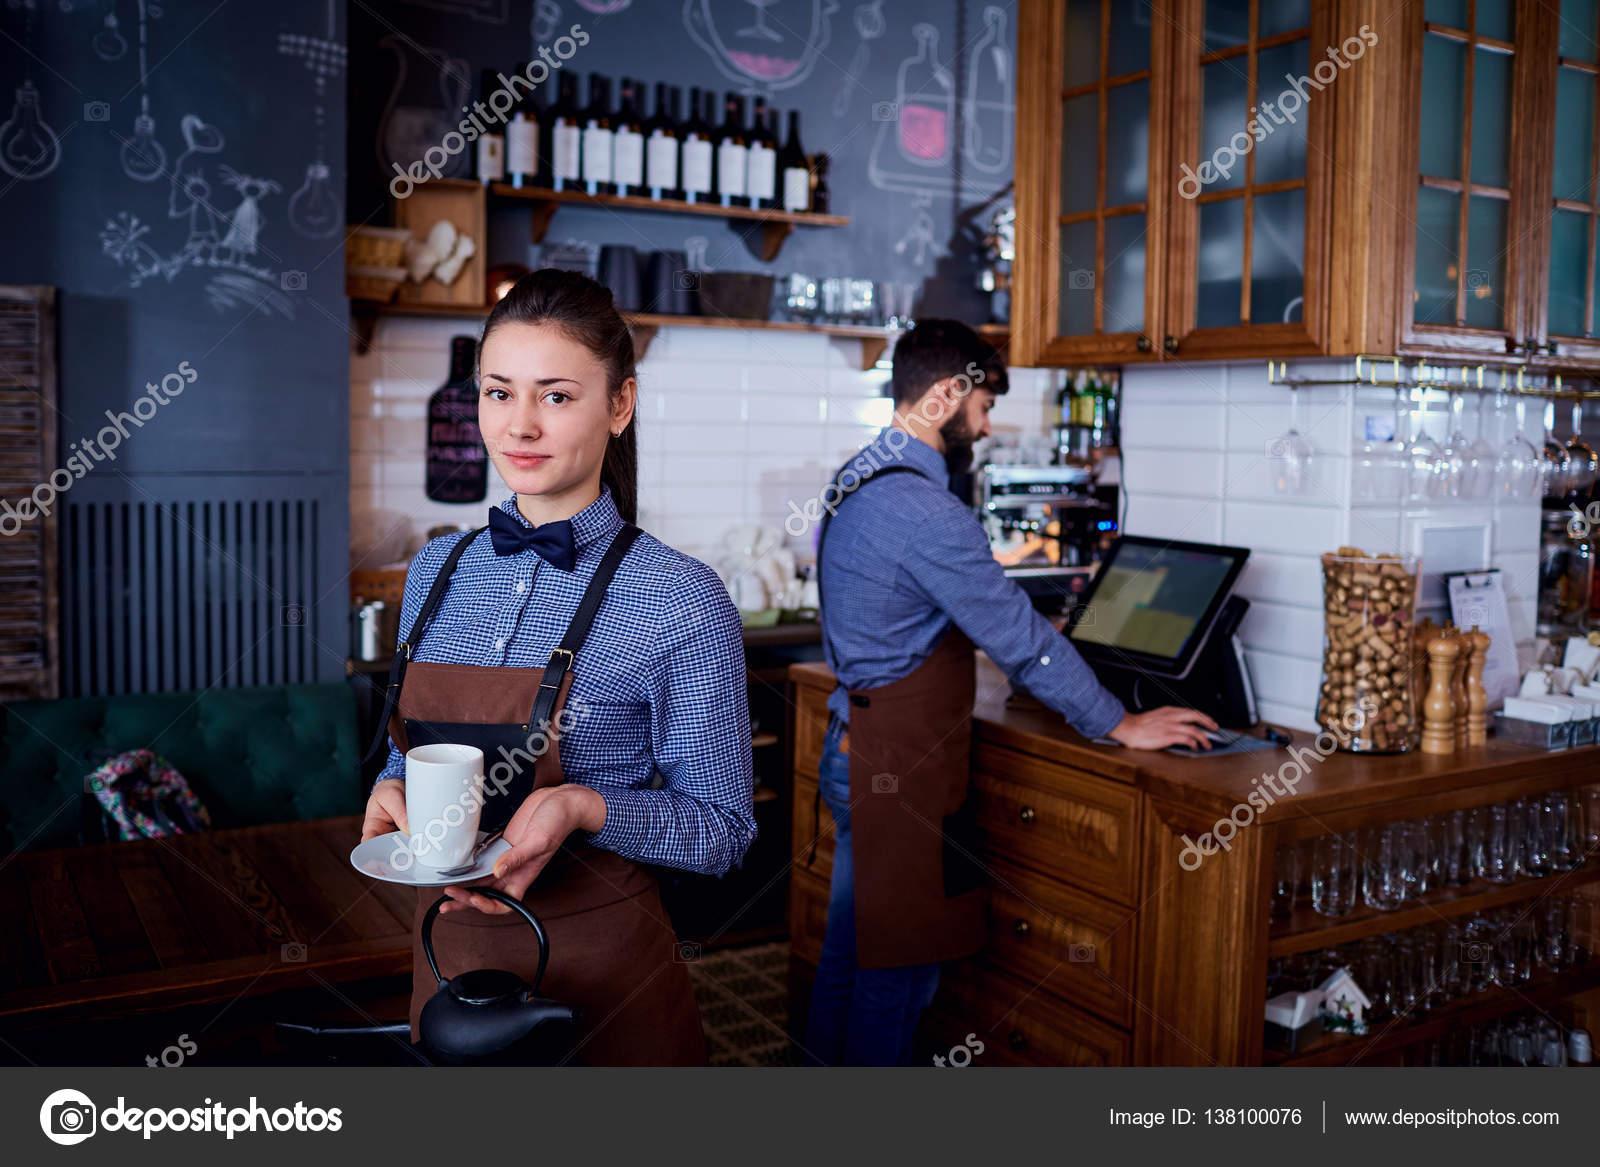 Официантки в трусиках в баре фото 668-112